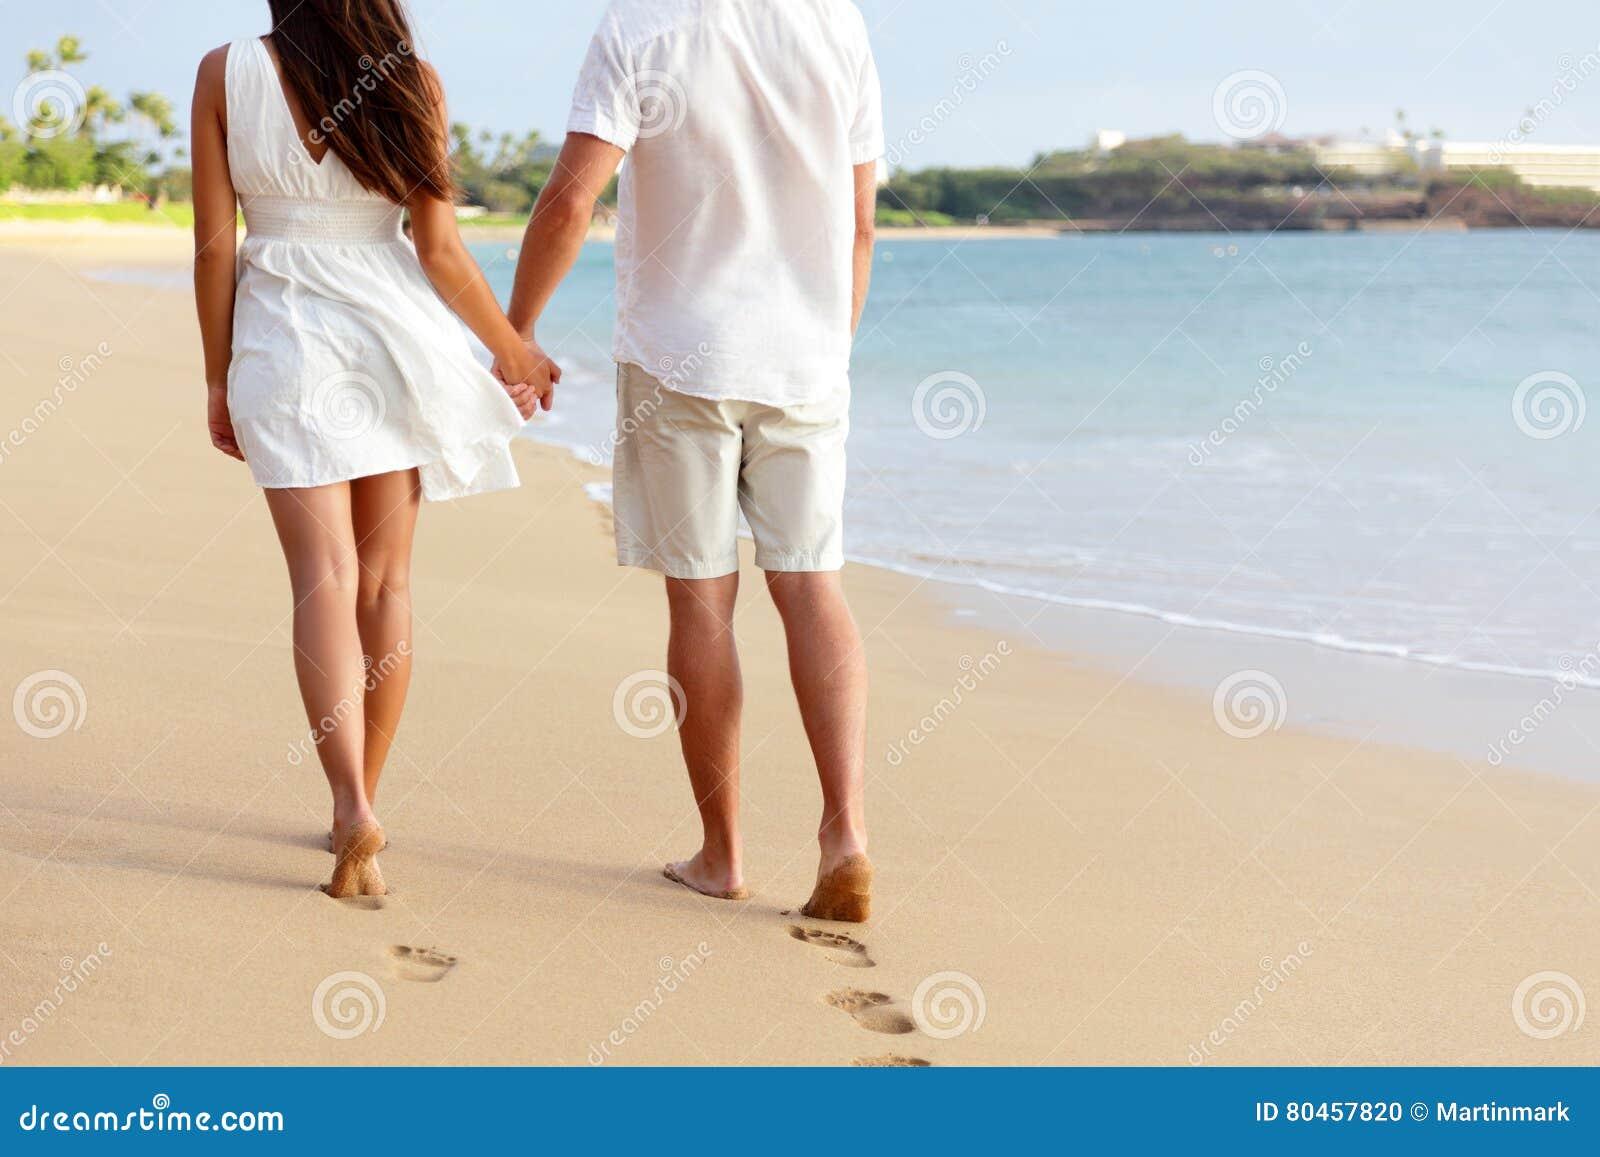 Honeymoon couple holding hands walking on beach stock for Honeymoon on the beach